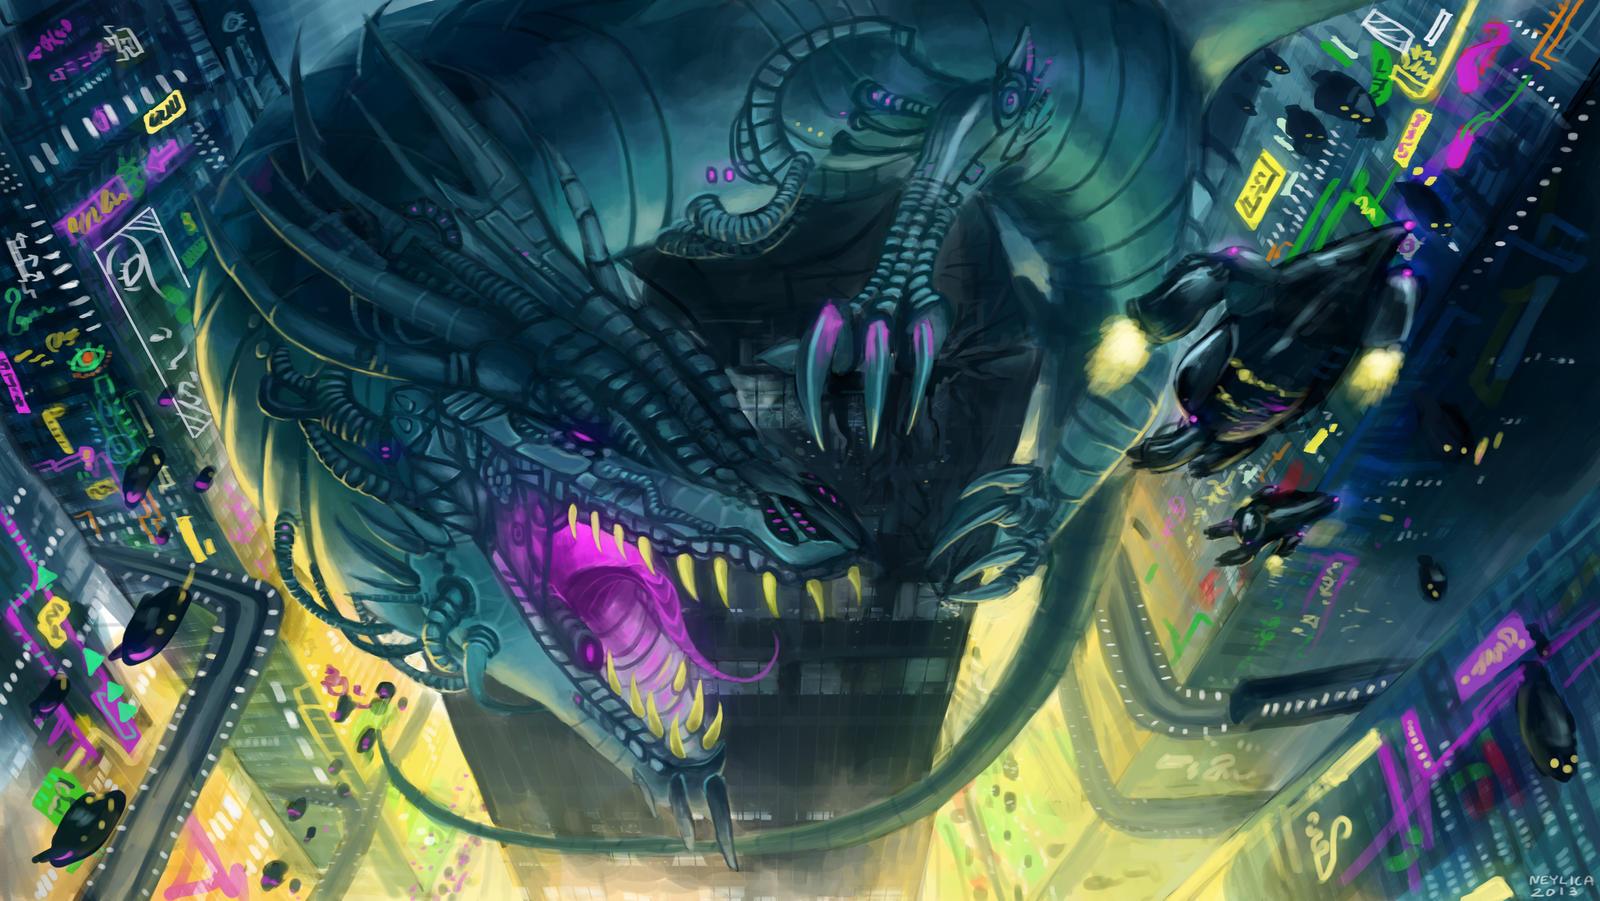 Cyber dragon attack by neylica on deviantart for Buy digital art online